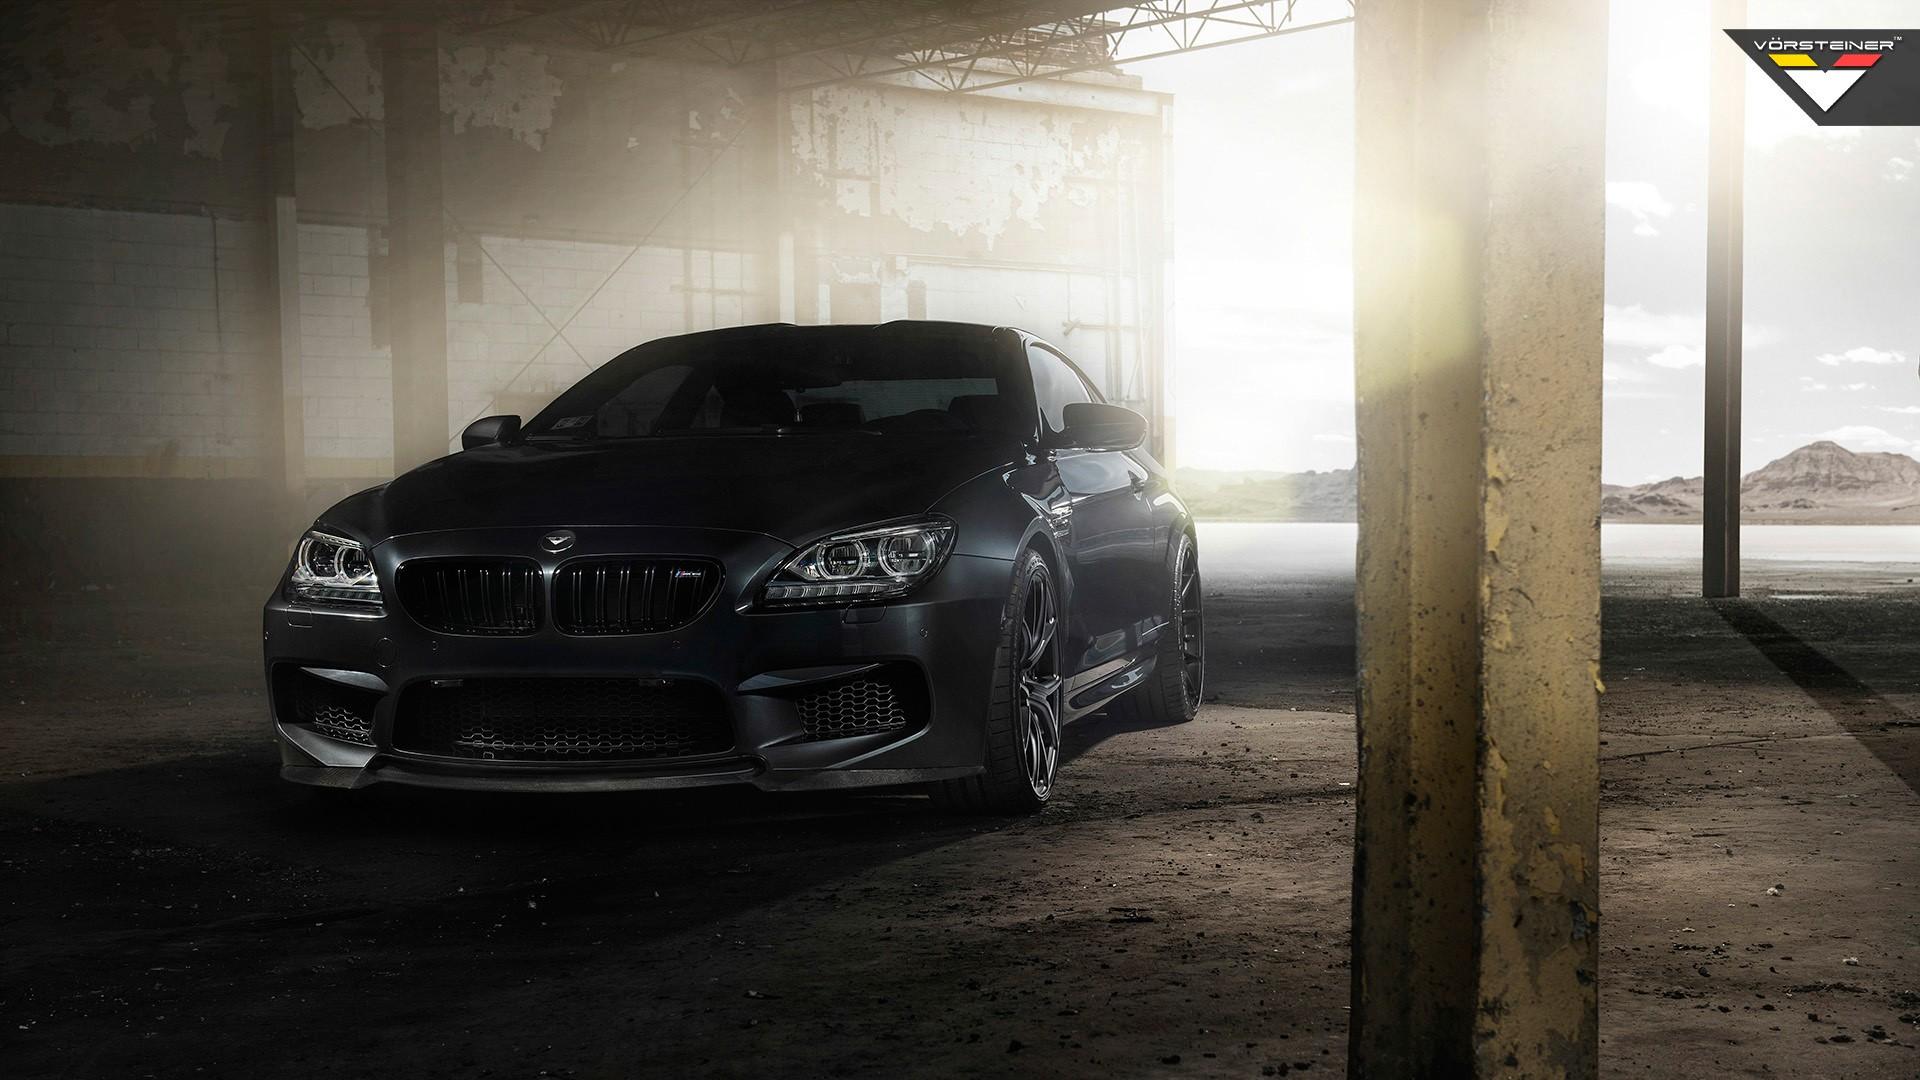 BMW M6 Gran Coupe >> 2014 Vorsteiner BMW M6 Gran Coupe Wallpaper | HD Car ...